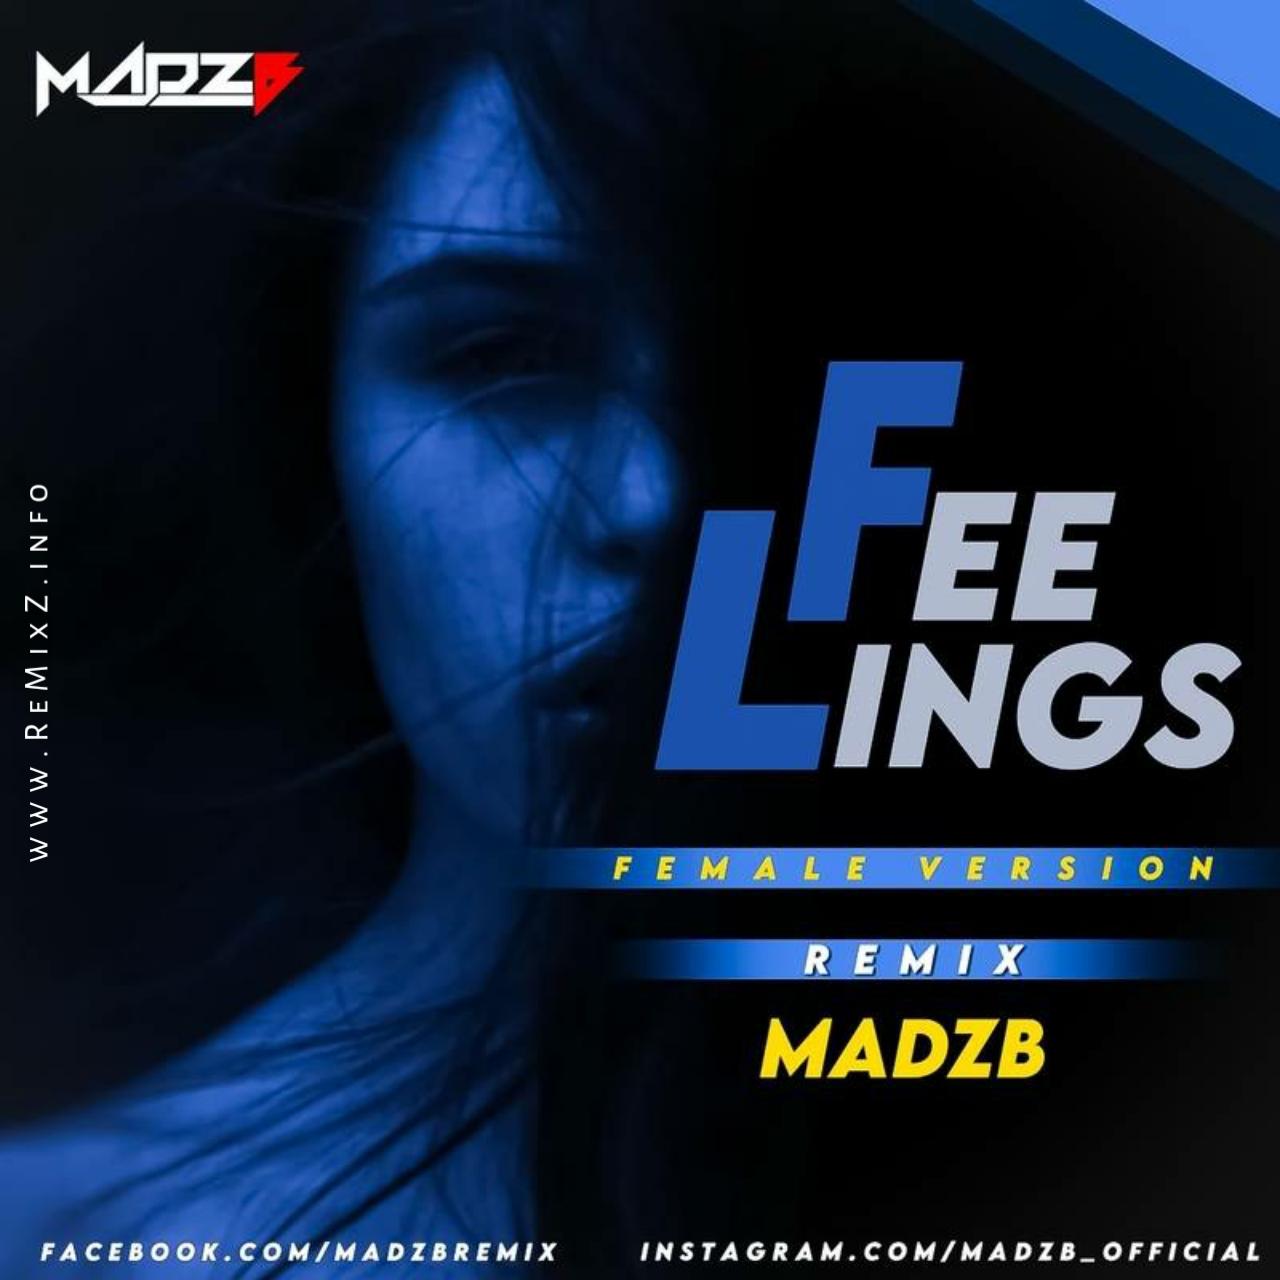 feelings-female-version-madzb-remix.jpg